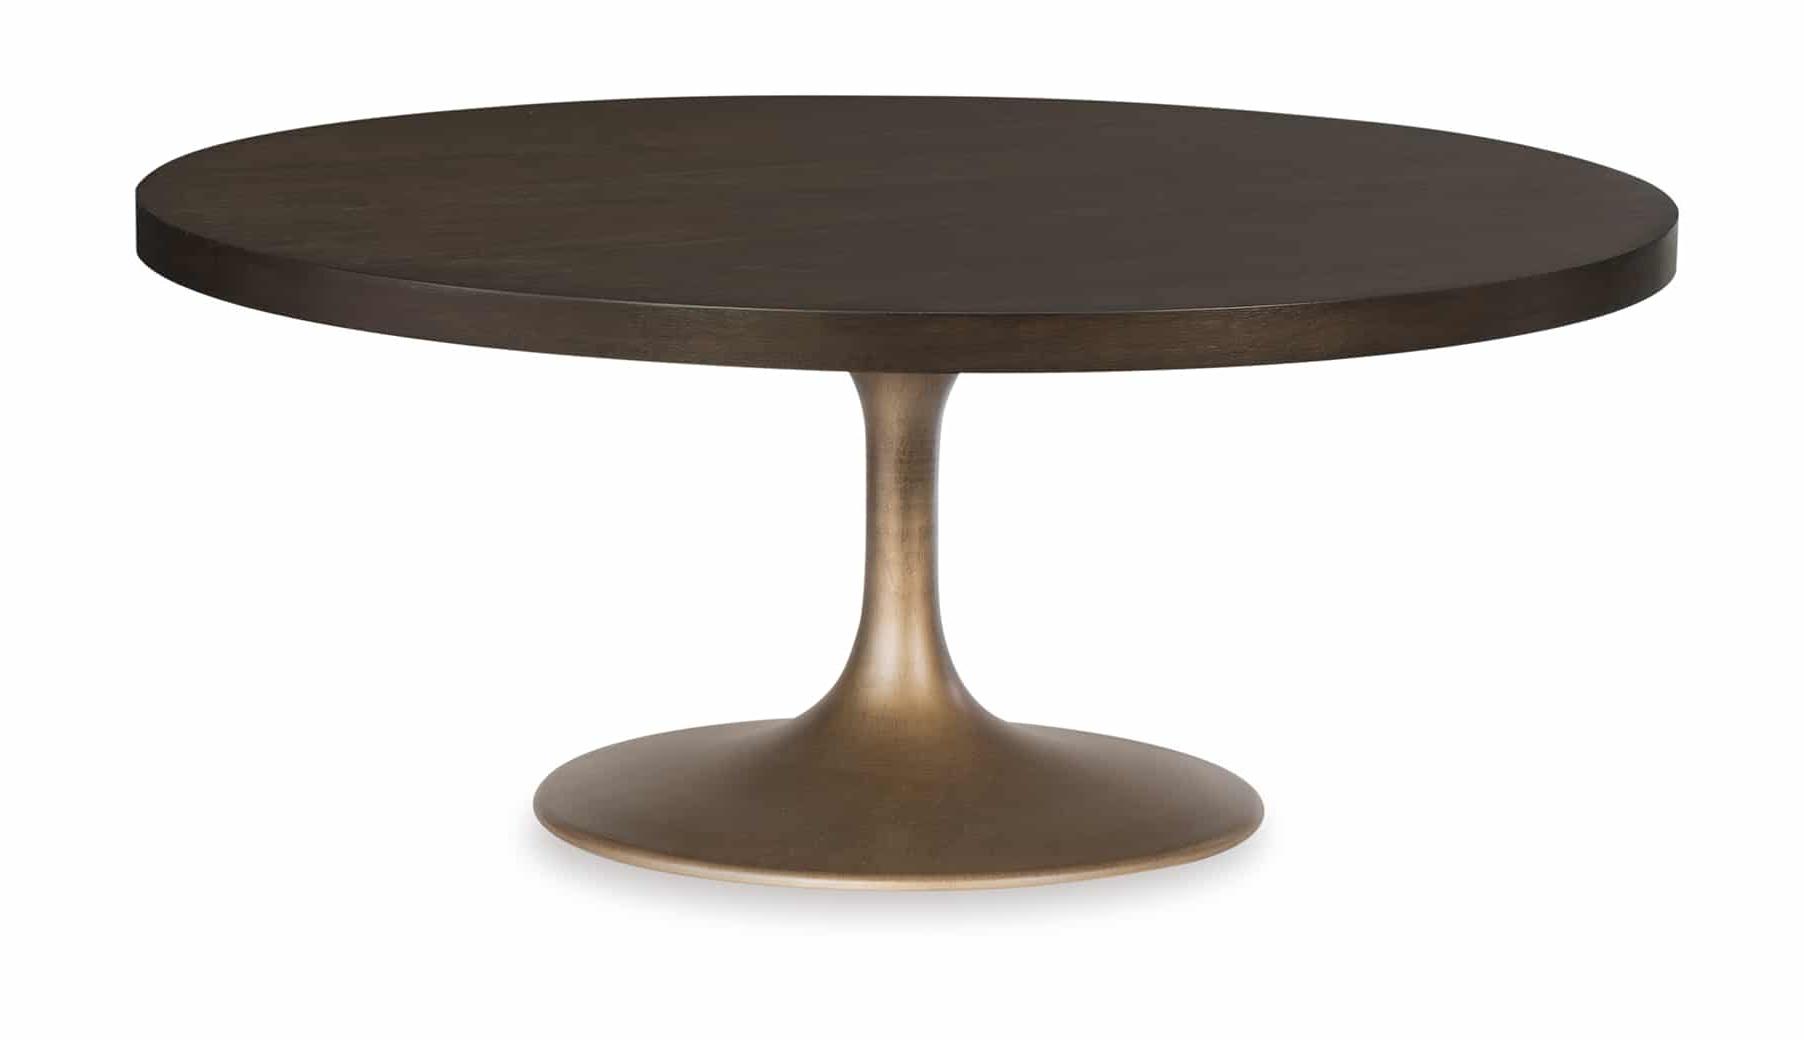 Dawson Pedestal Tables for 2019 Round Pedestal Cocktail Table - Rachael Ray